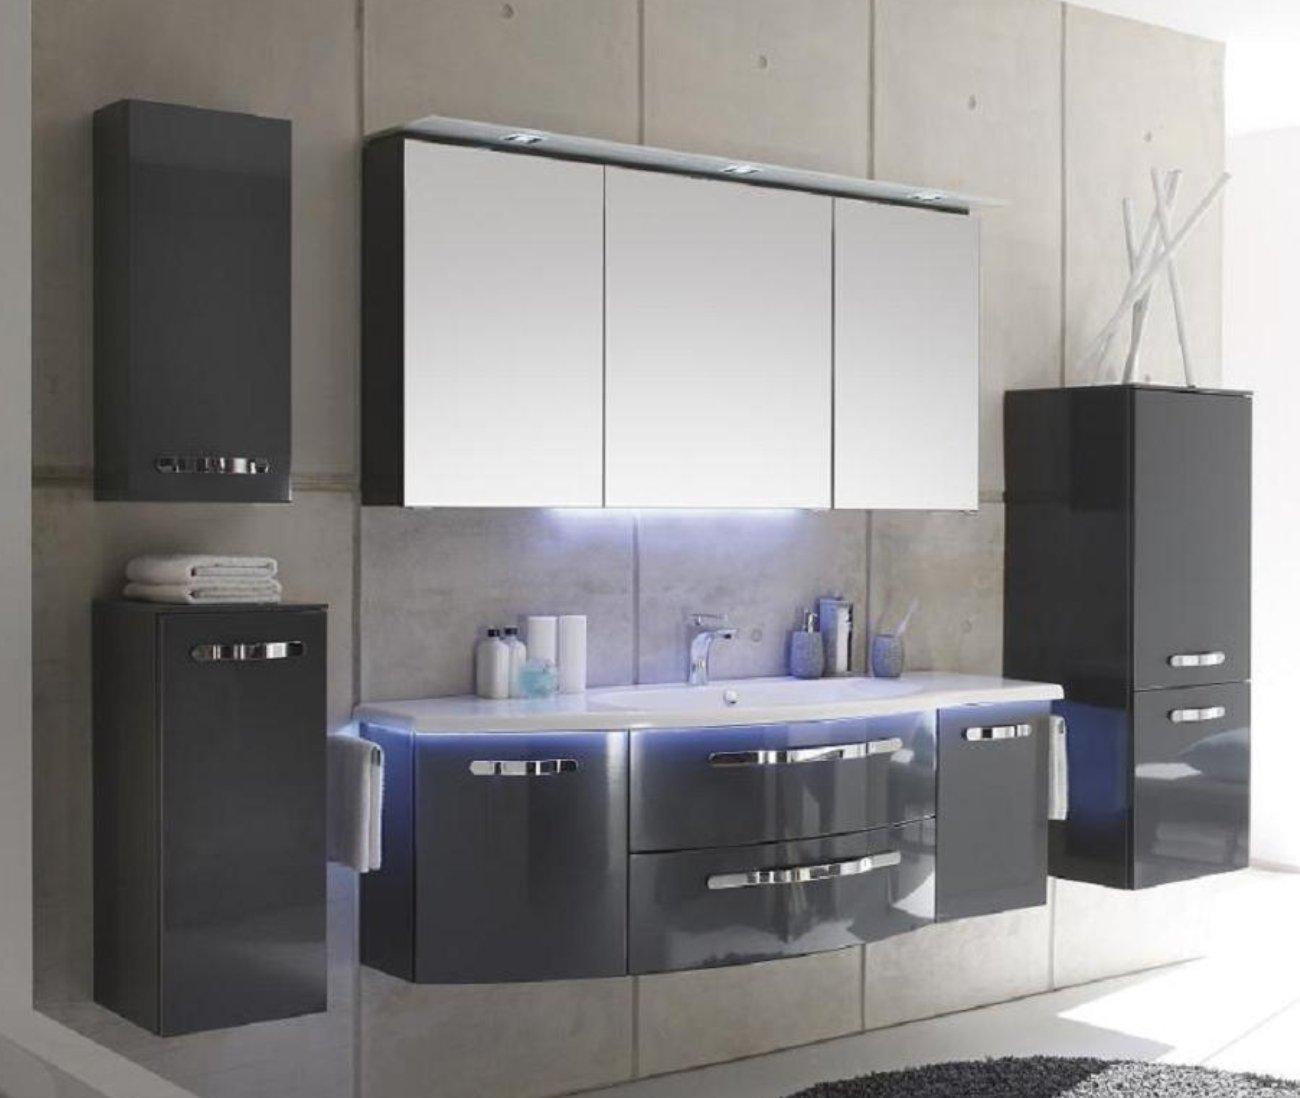 pelipal solitaire 7005 set badm bel exclusiv. Black Bedroom Furniture Sets. Home Design Ideas